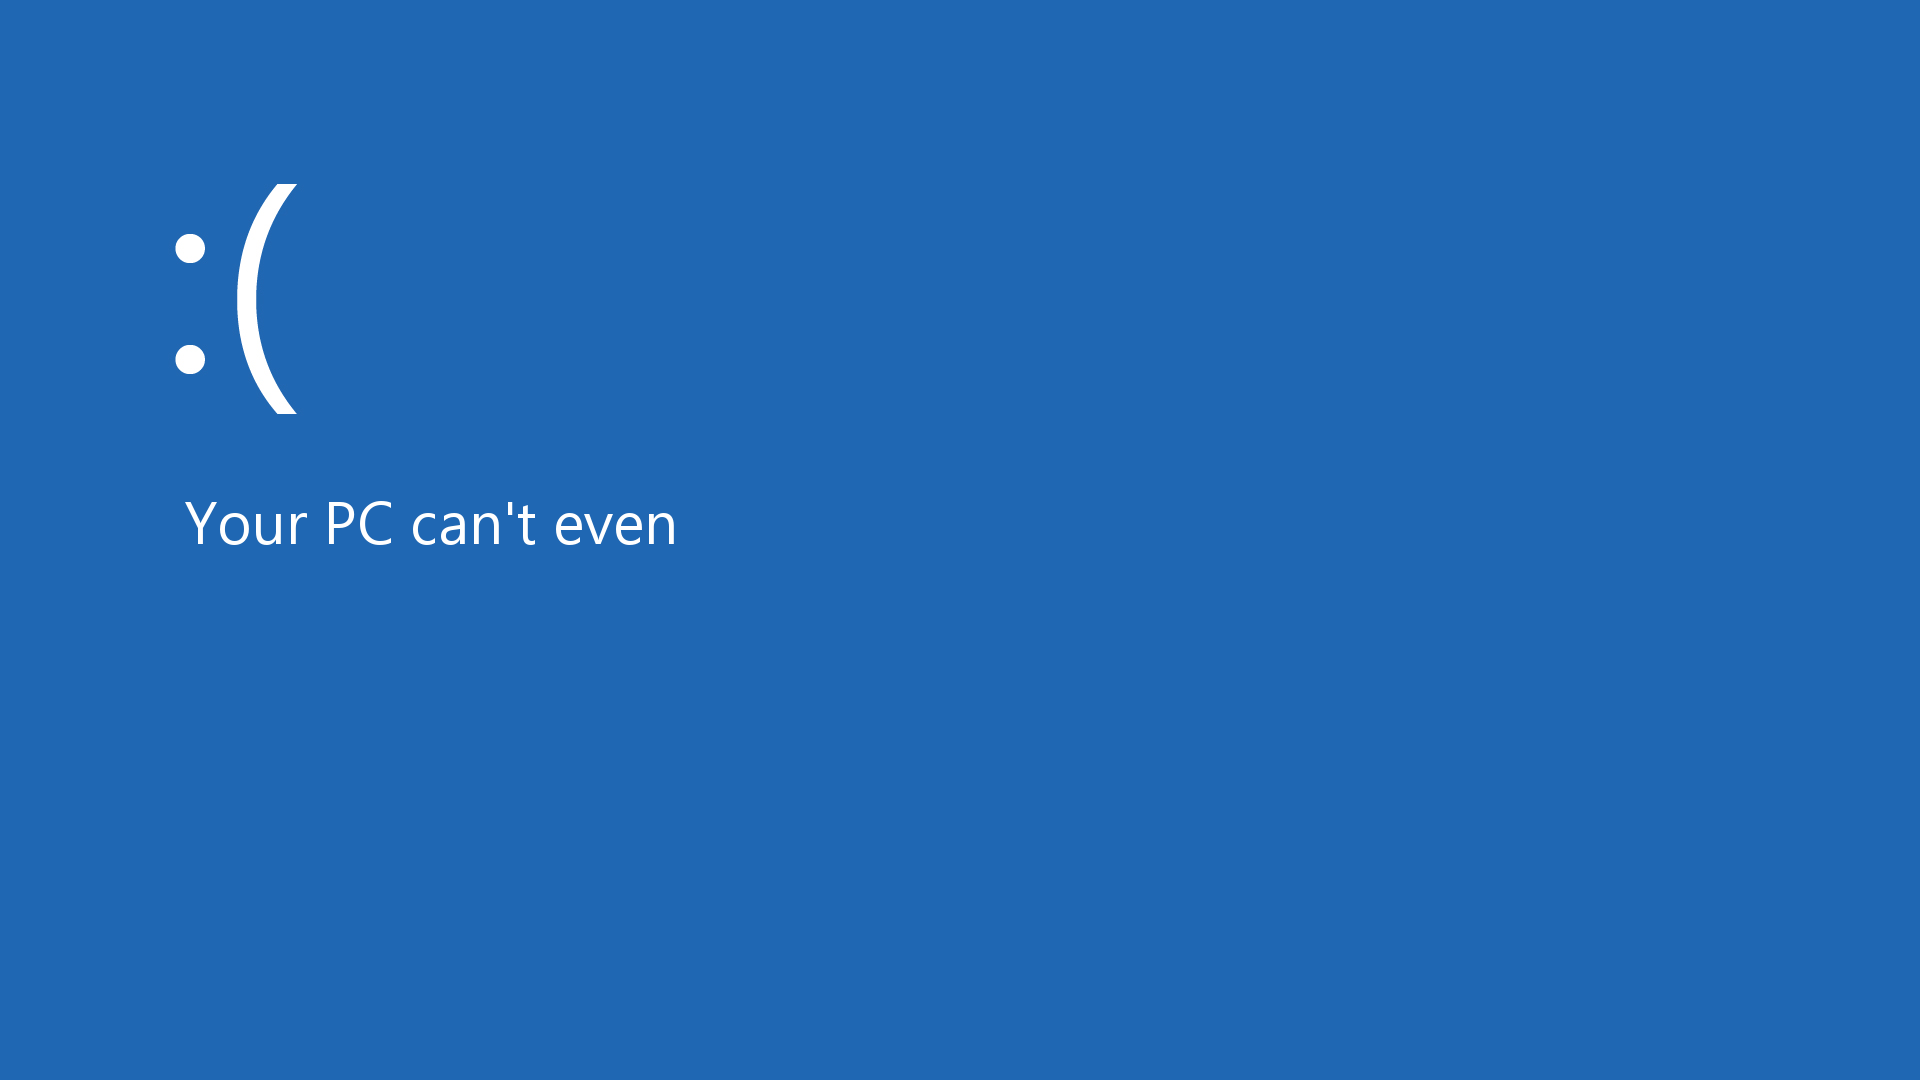 windows 8 humor frown emoticons